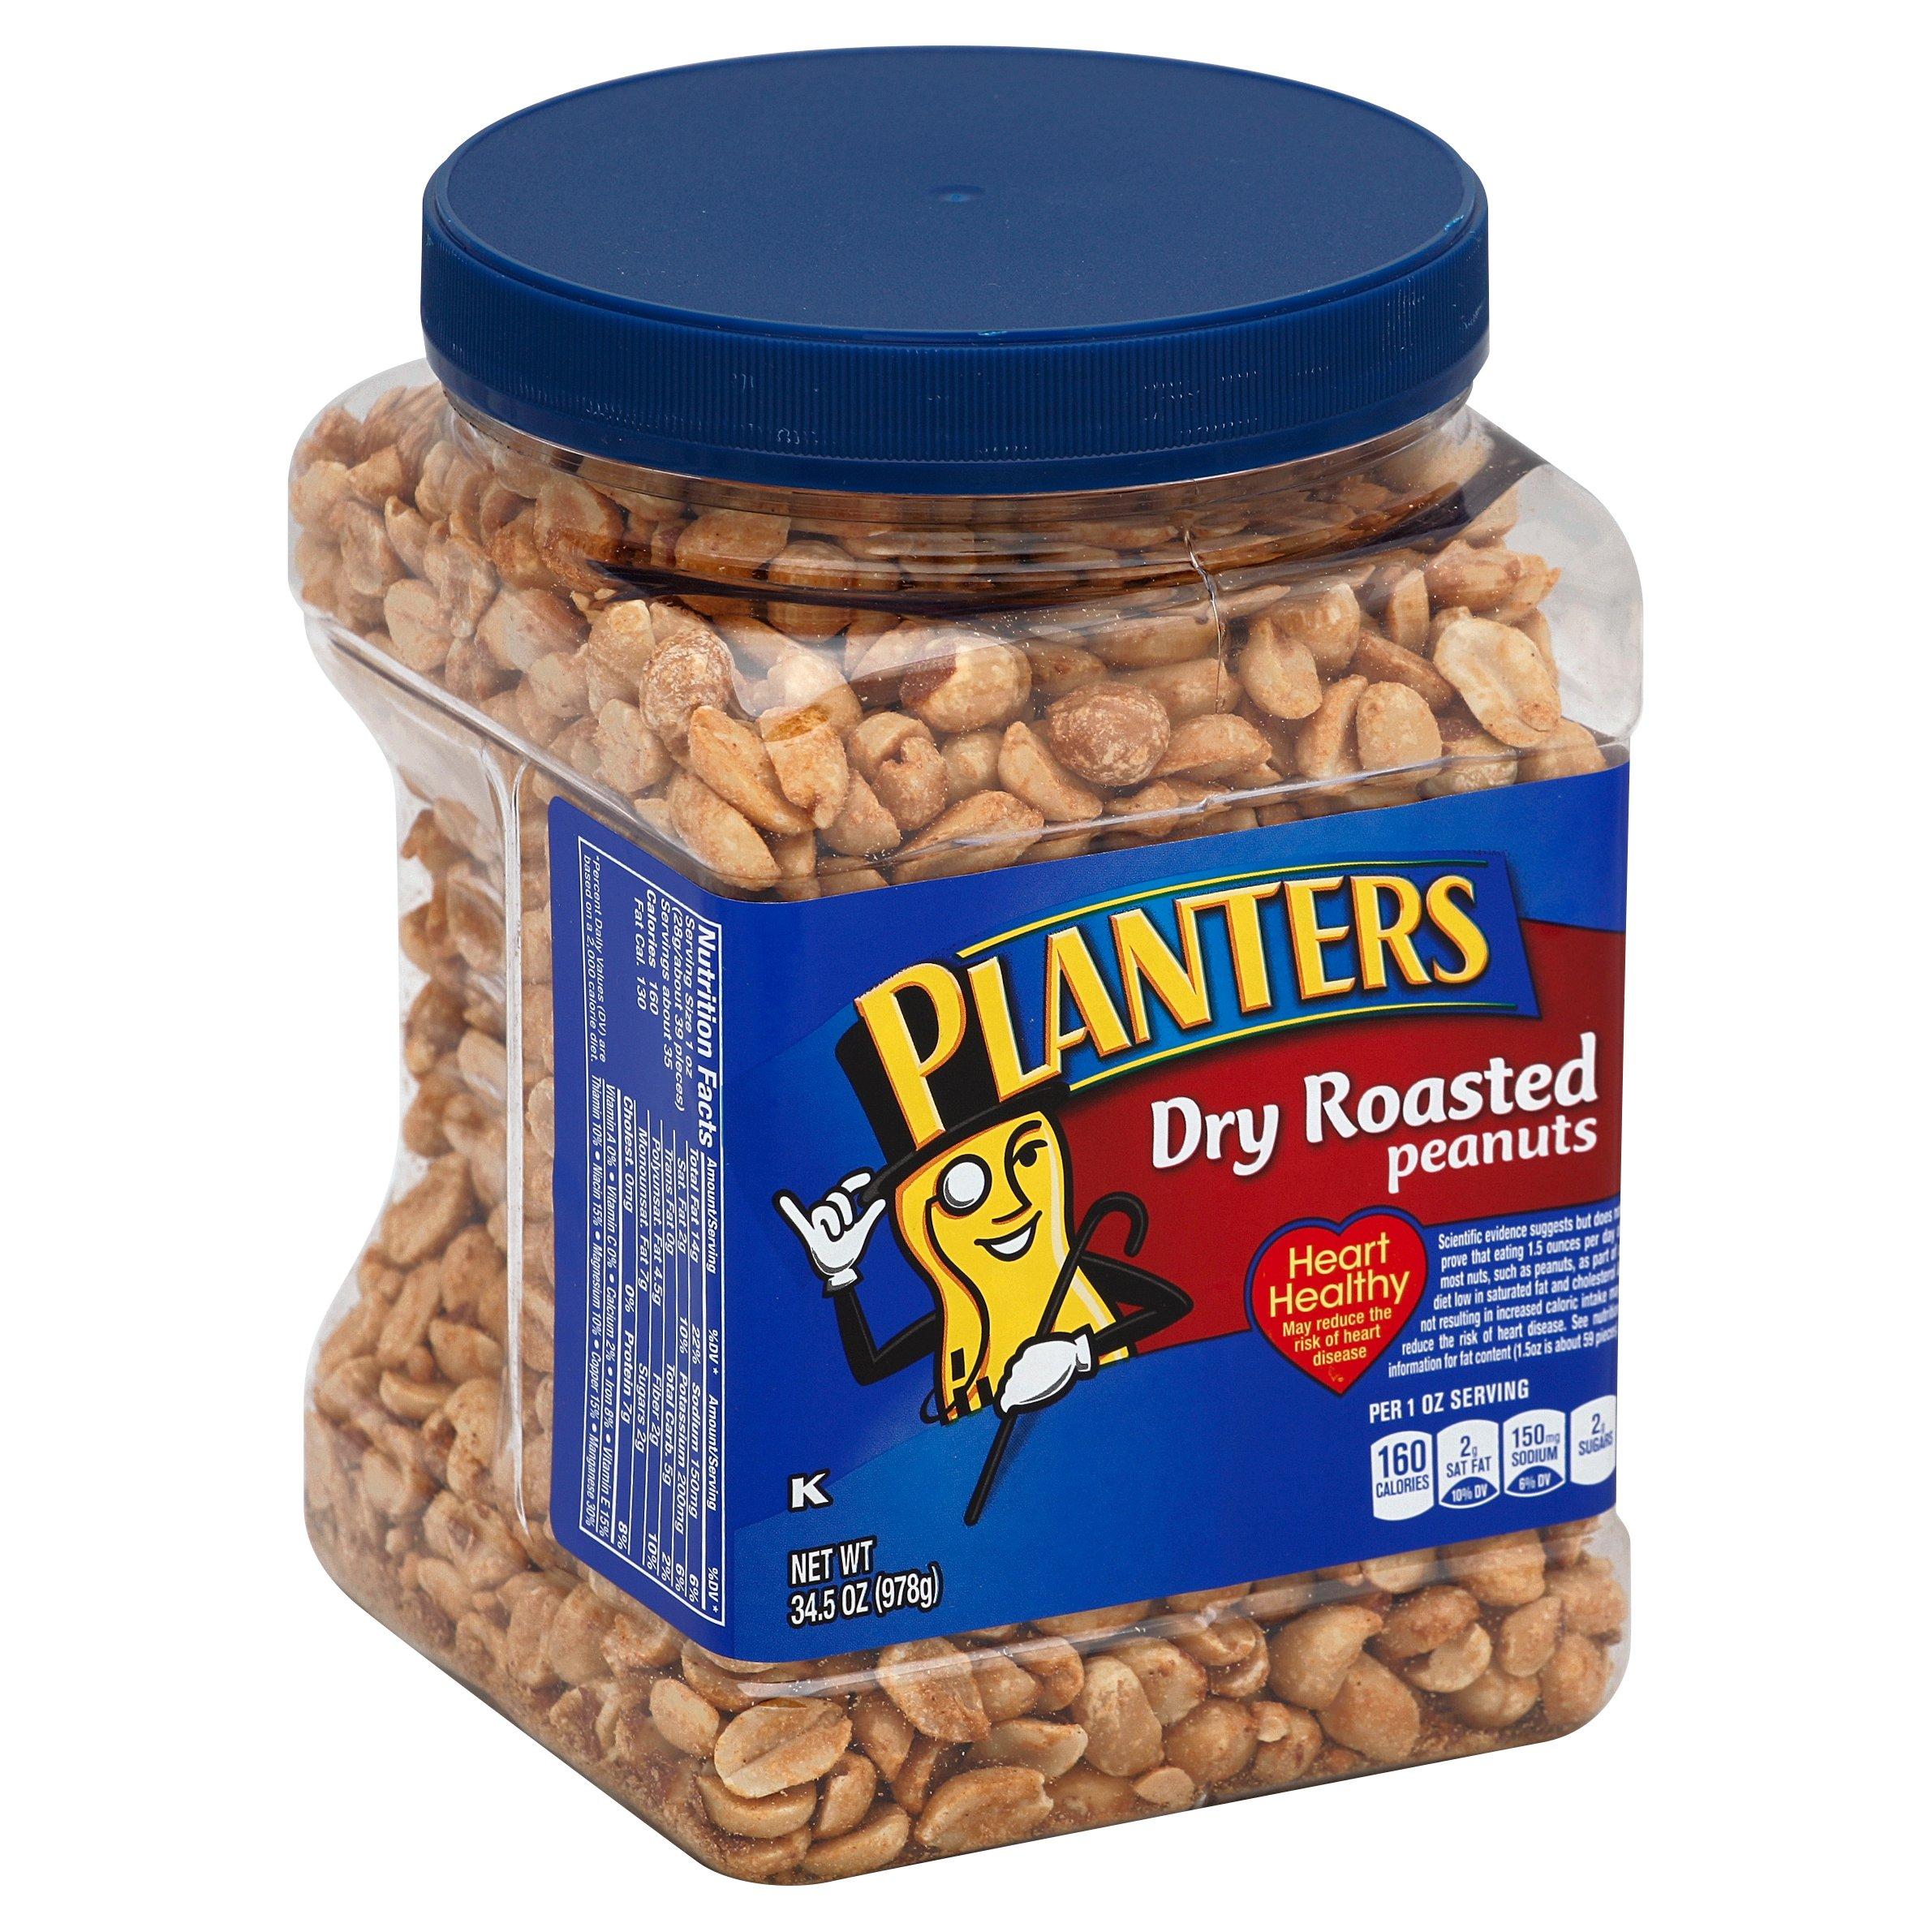 Planters Dry Roasted Peanuts - Shop